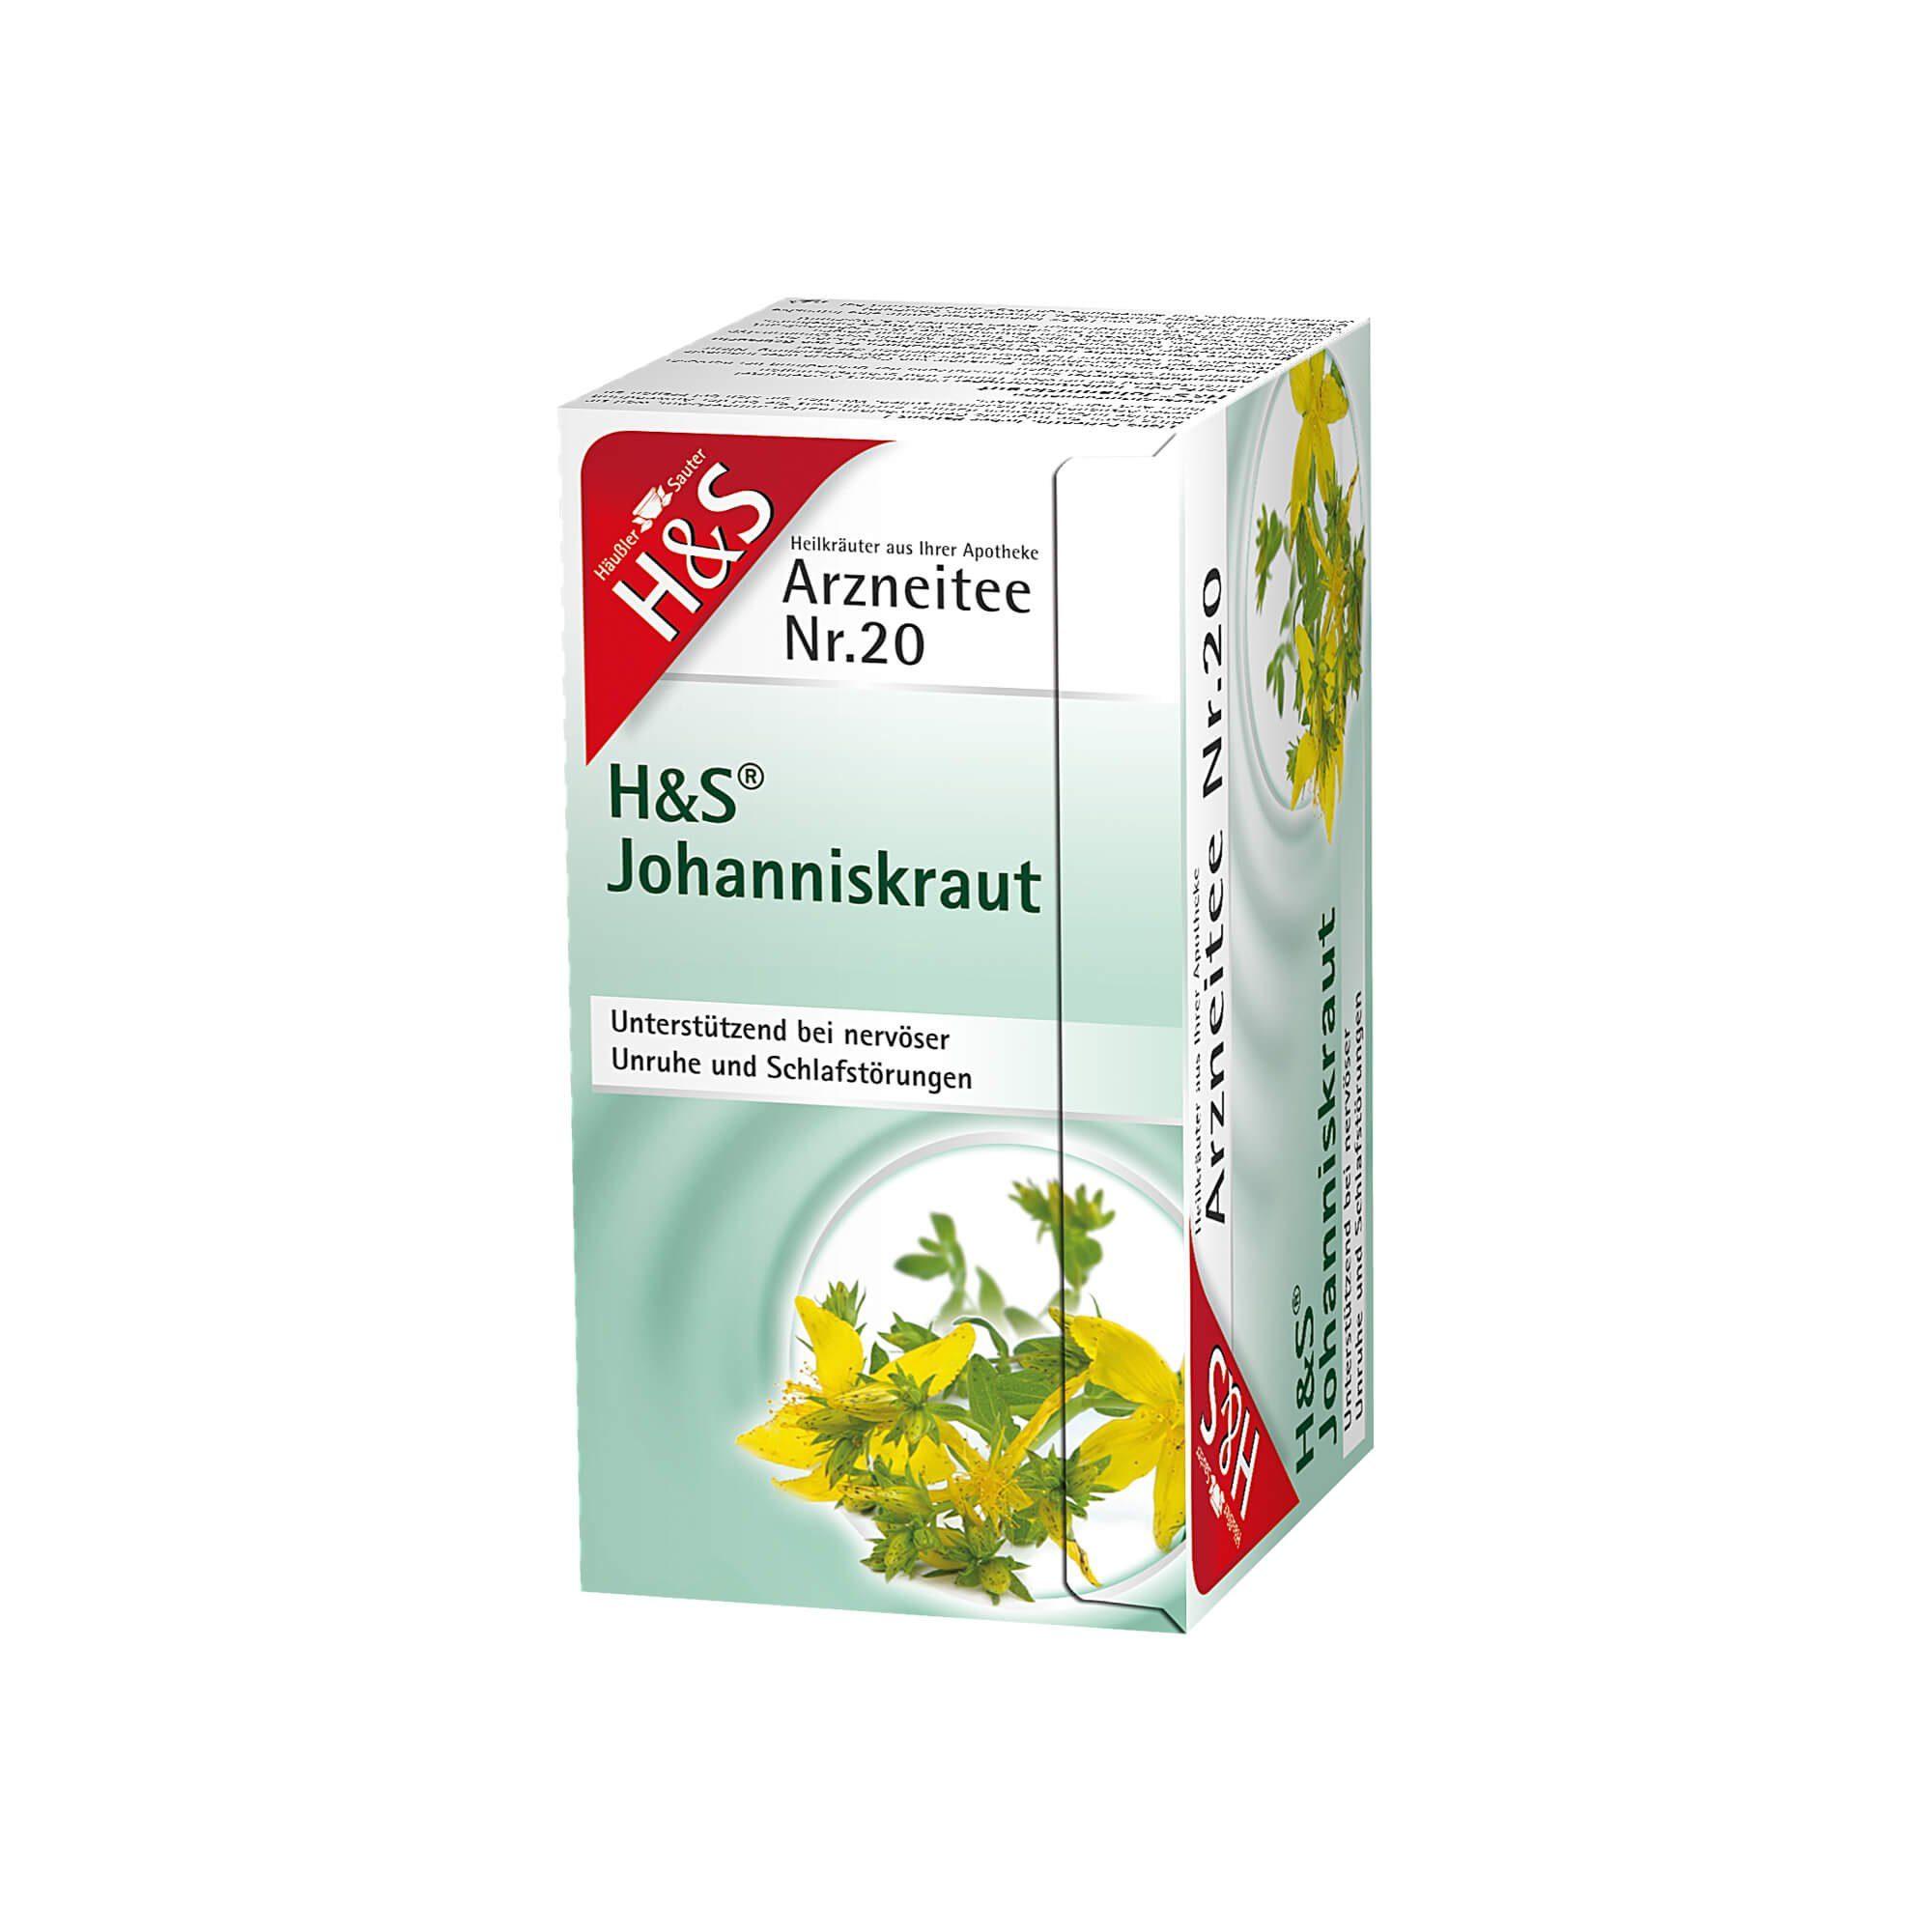 H&S Johanniskraut, 20 St